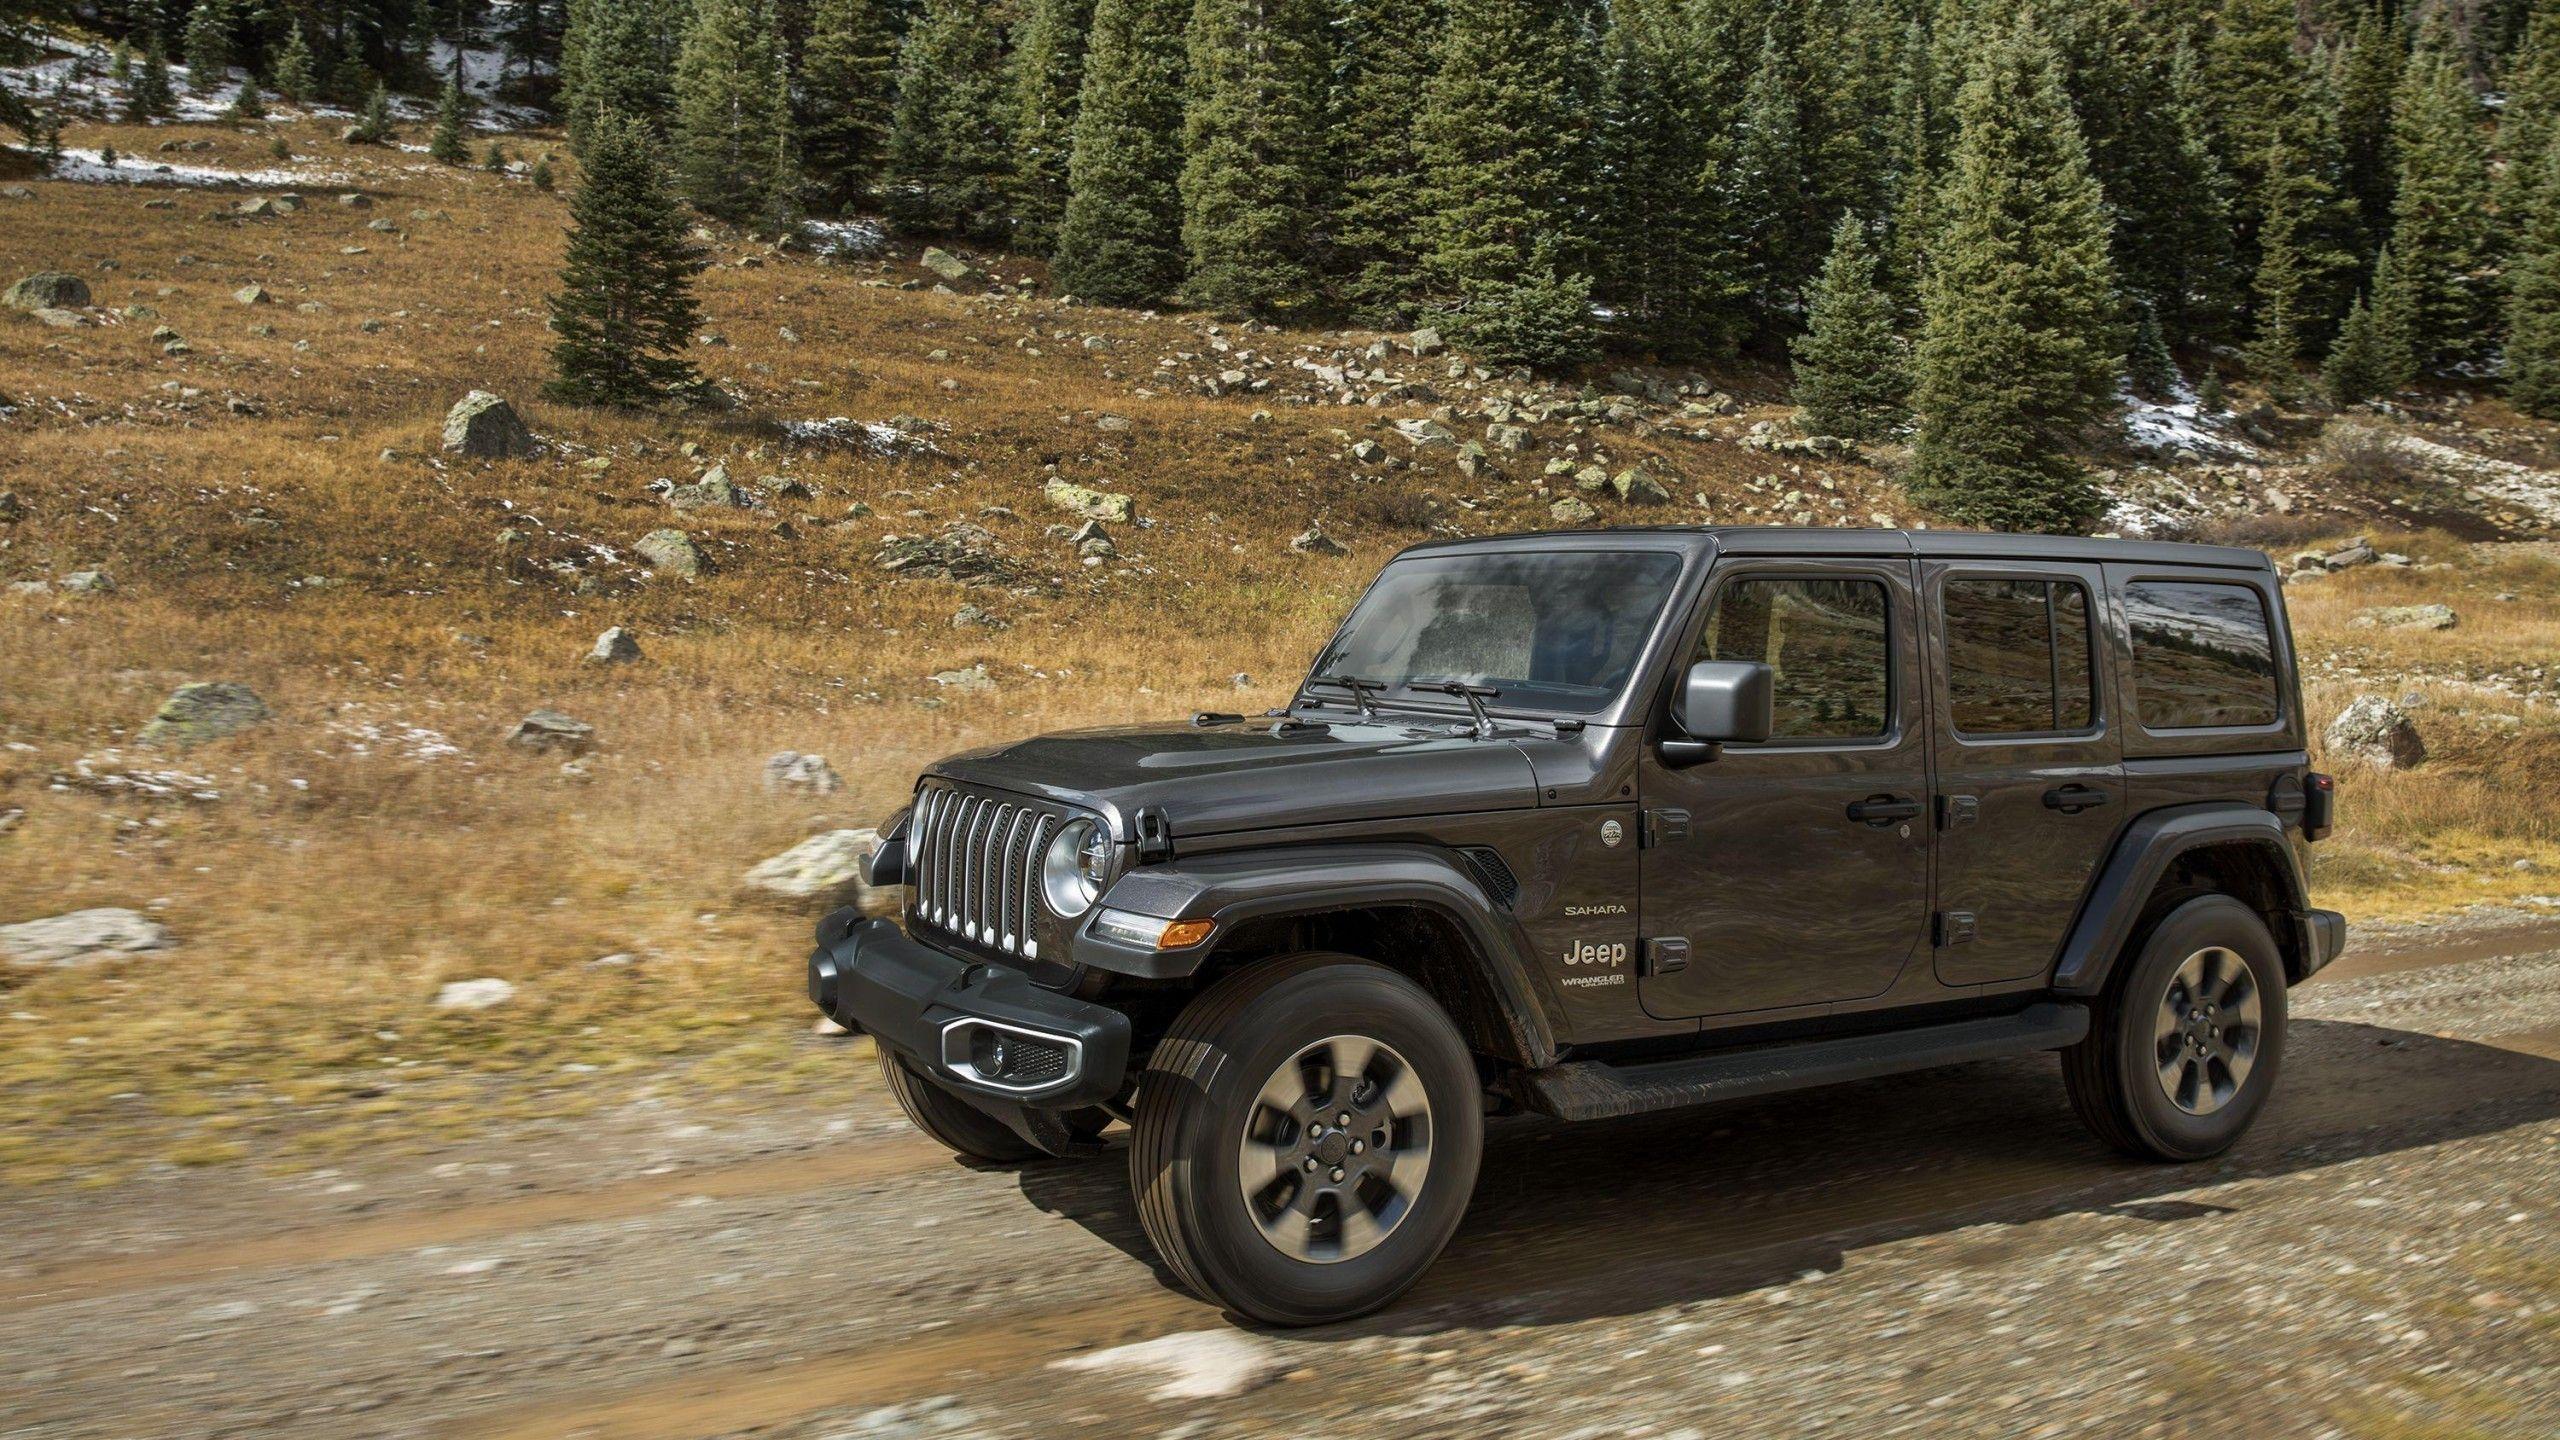 Jeep Wrangler Suv 2019 Cars 4k 16824 Jeep Wrangler 2018 Jeep Wrangler Unlimited Jeep Wrangler Unlimited